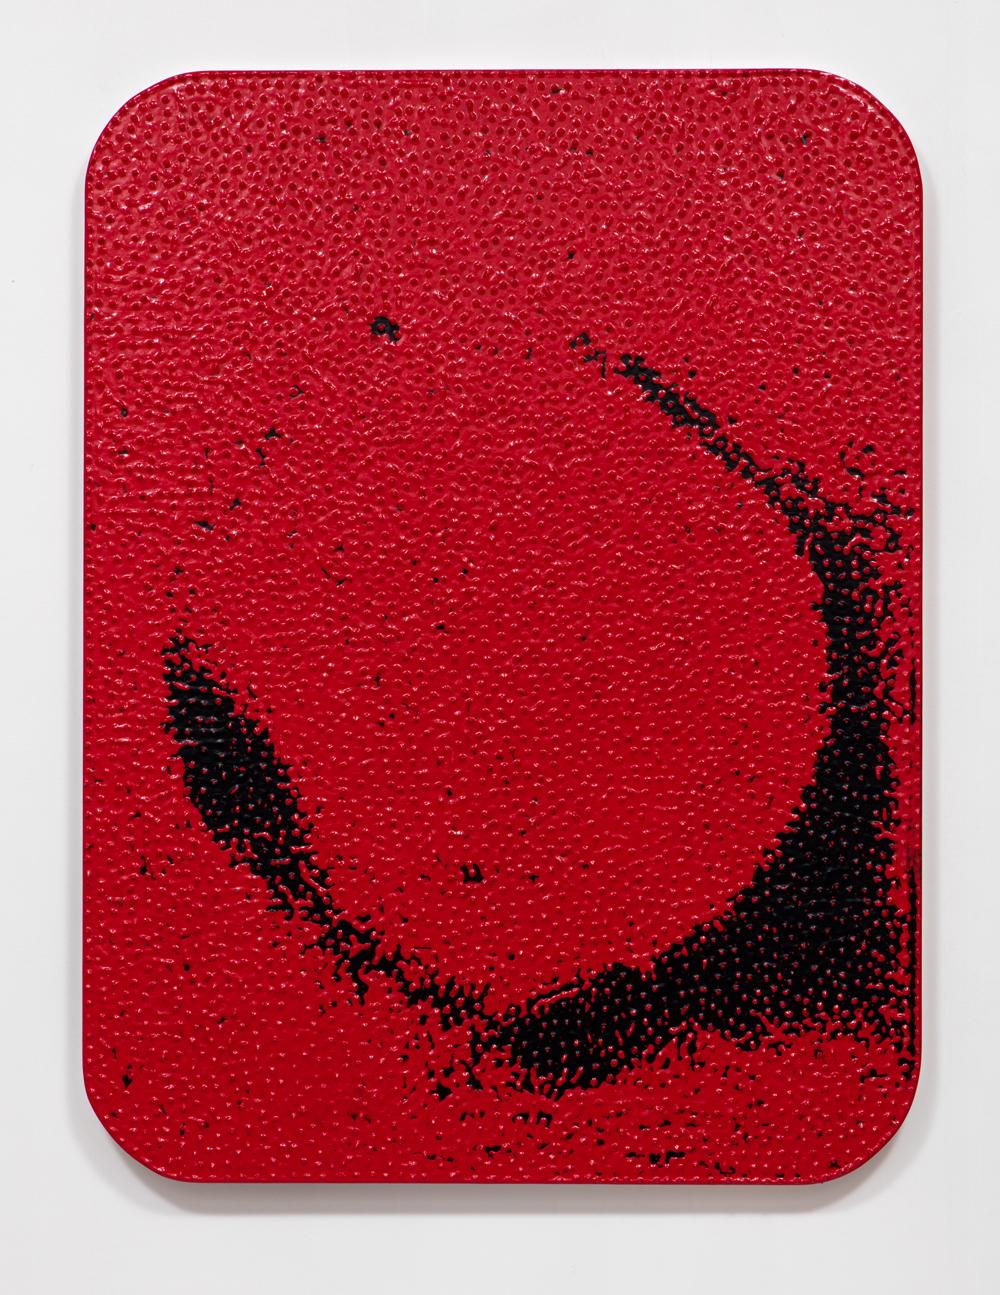 SLATE: Dip Painting No. 5 (1b, 1r, 1b, 1r)  , 2015 Valspar Reserve Semi-Gloss Interior Paint, Valspar Signature Satin Interior Painting and Dipping on custom panel 48 x 36 inches